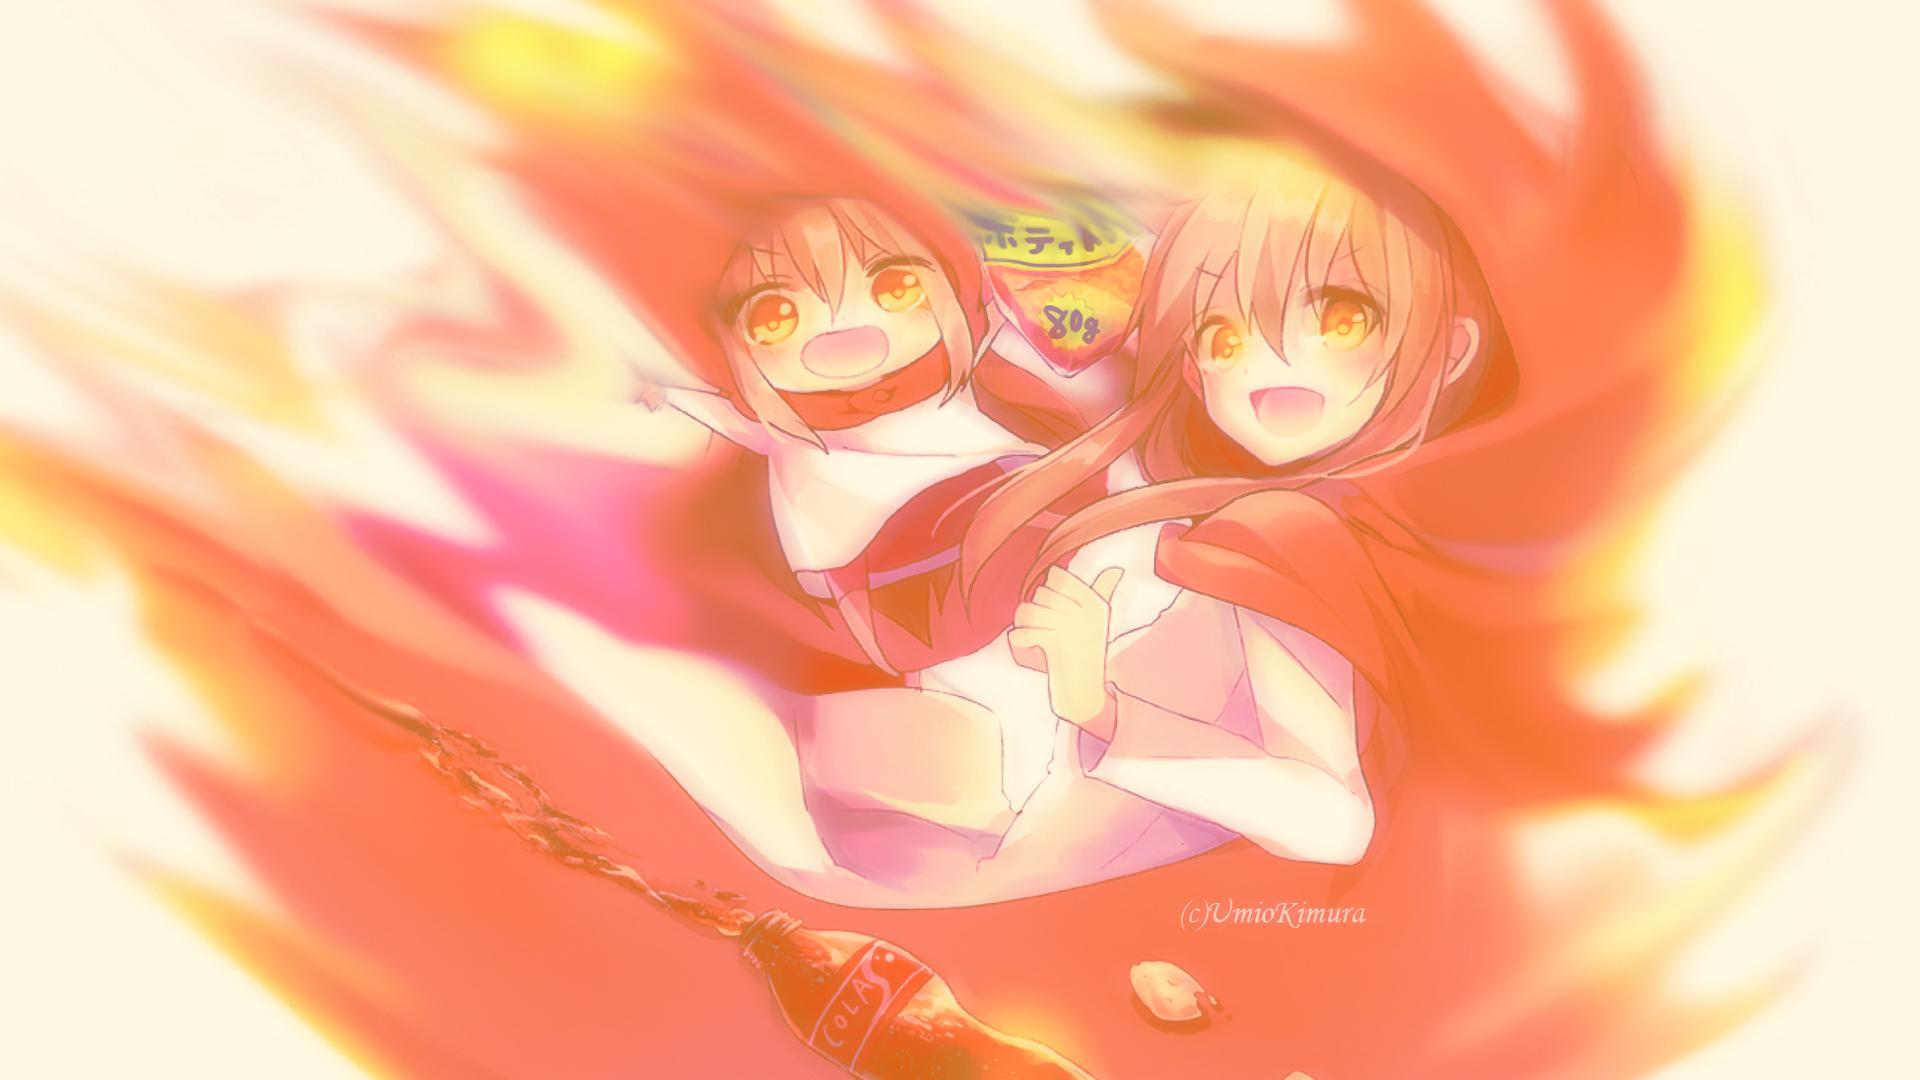 Himouto! Umaru-chan Wallpaper HD Download